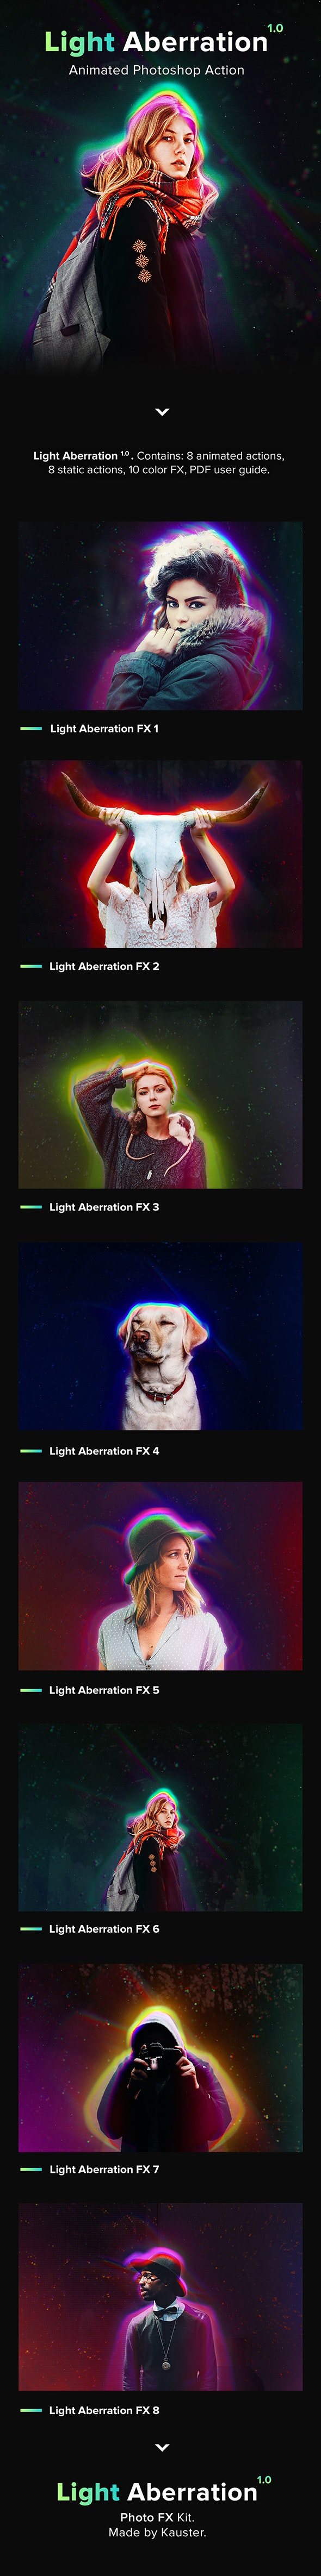 Animated Light Aberration - Photoshop Action - Photo Effects Actions